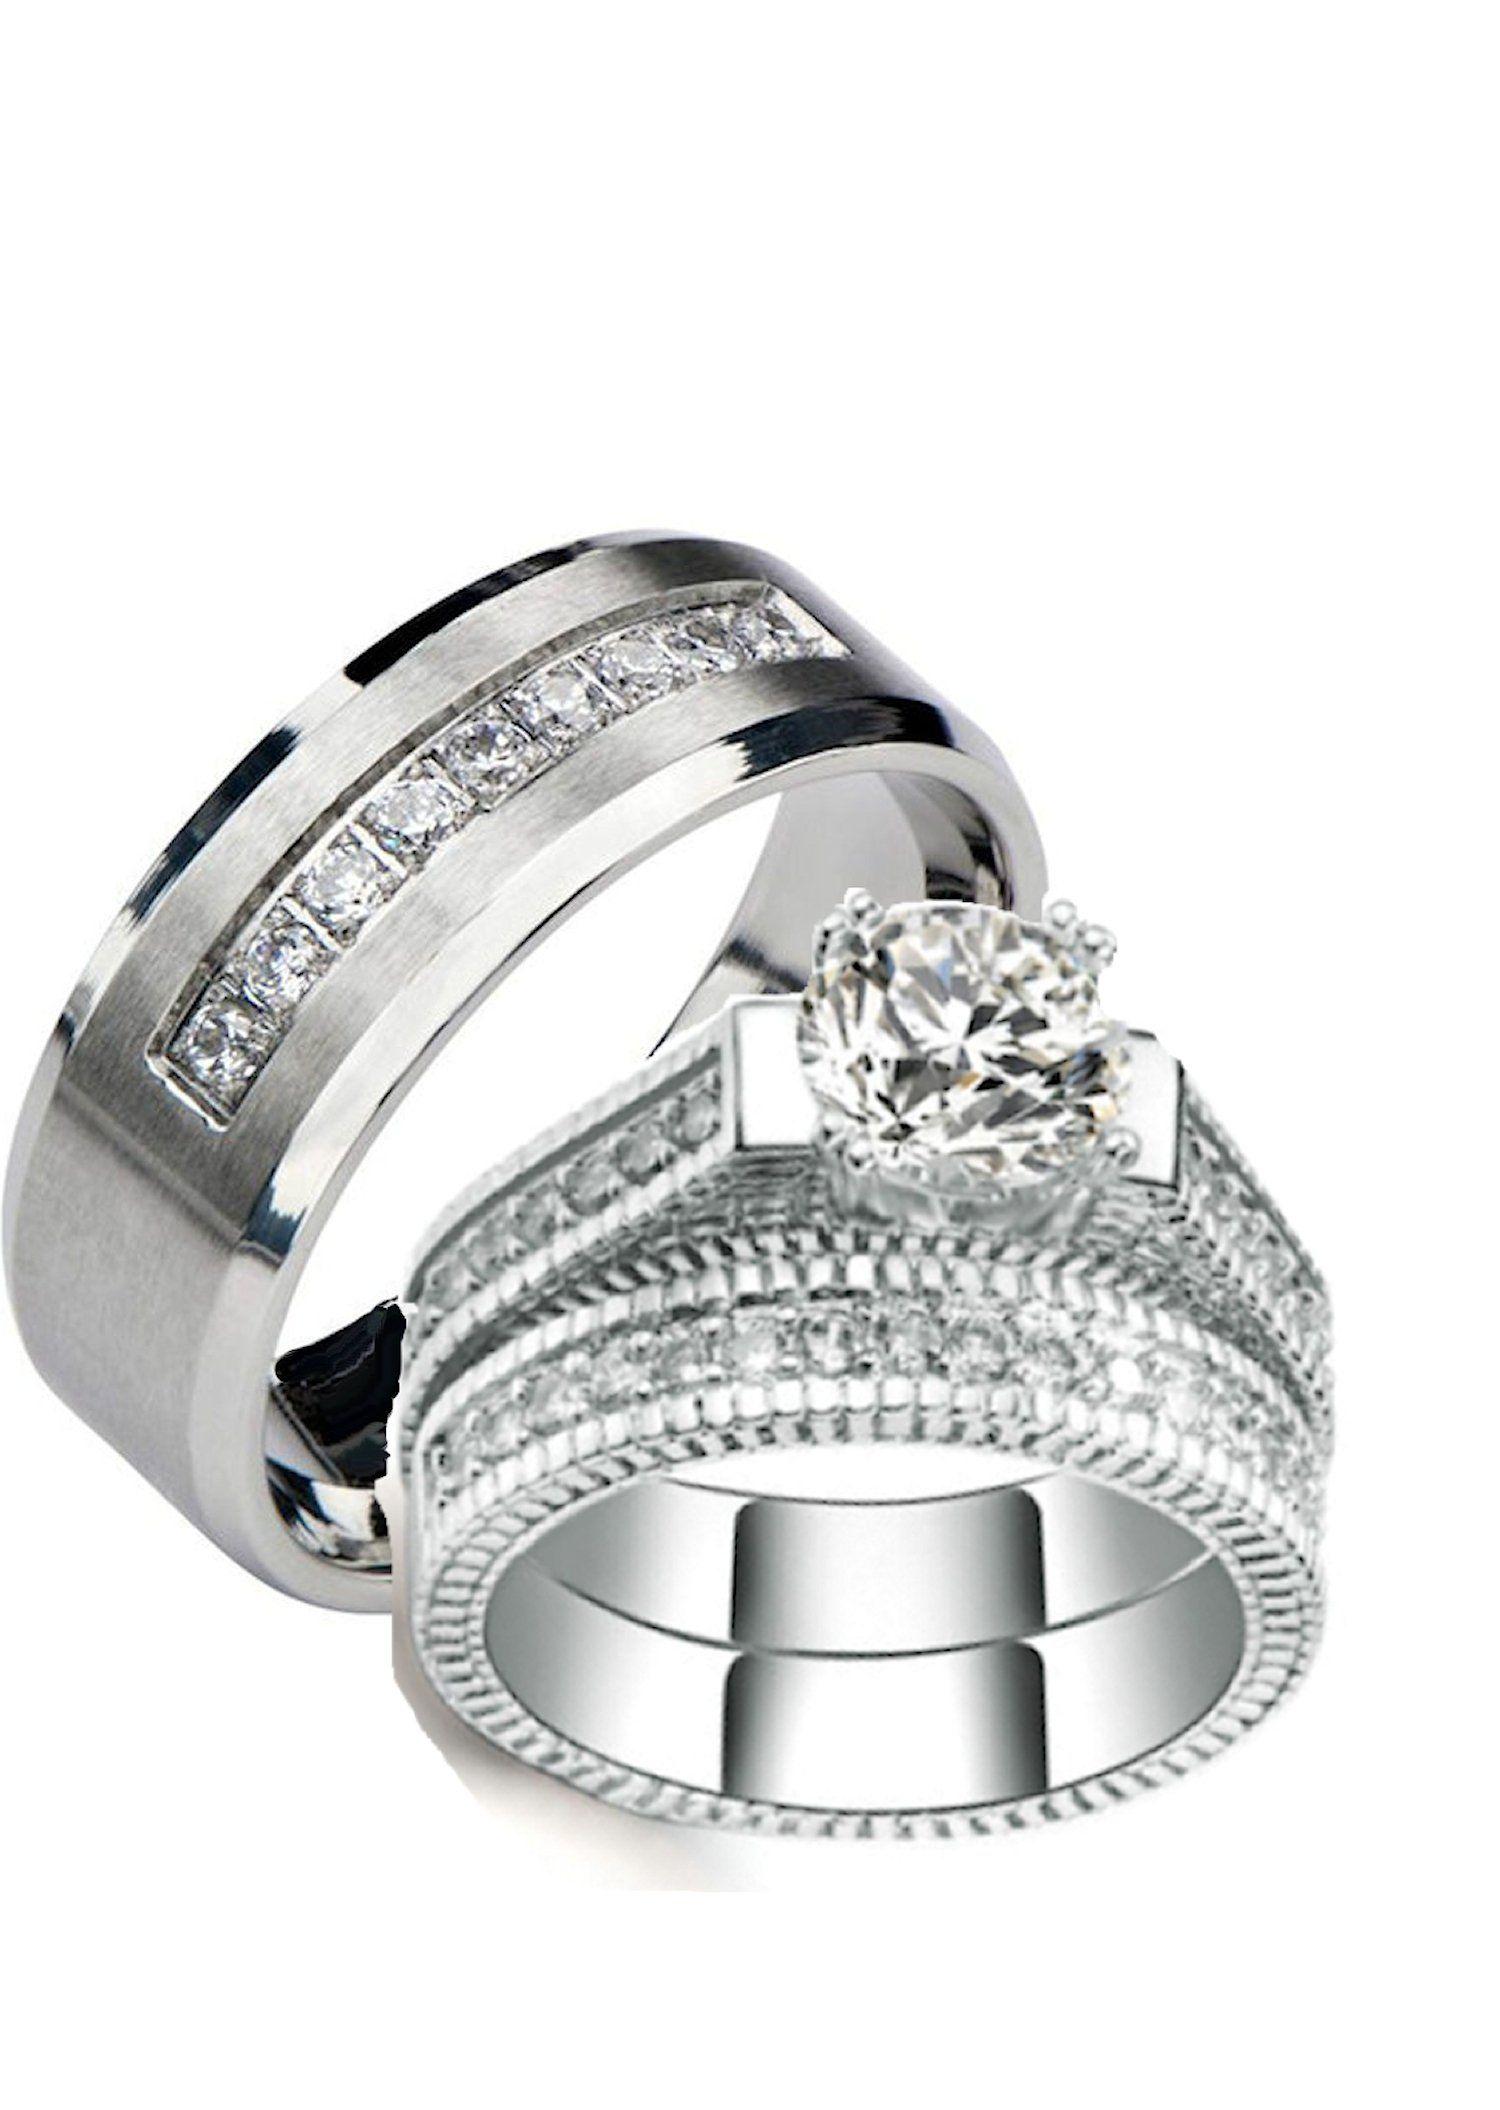 His Hers Wedding Ring Sets Cz Matching Wedding Ring Set Wedding Rings Sets His And Hers Cz Wedding Ring Sets Wedding Ring Sets